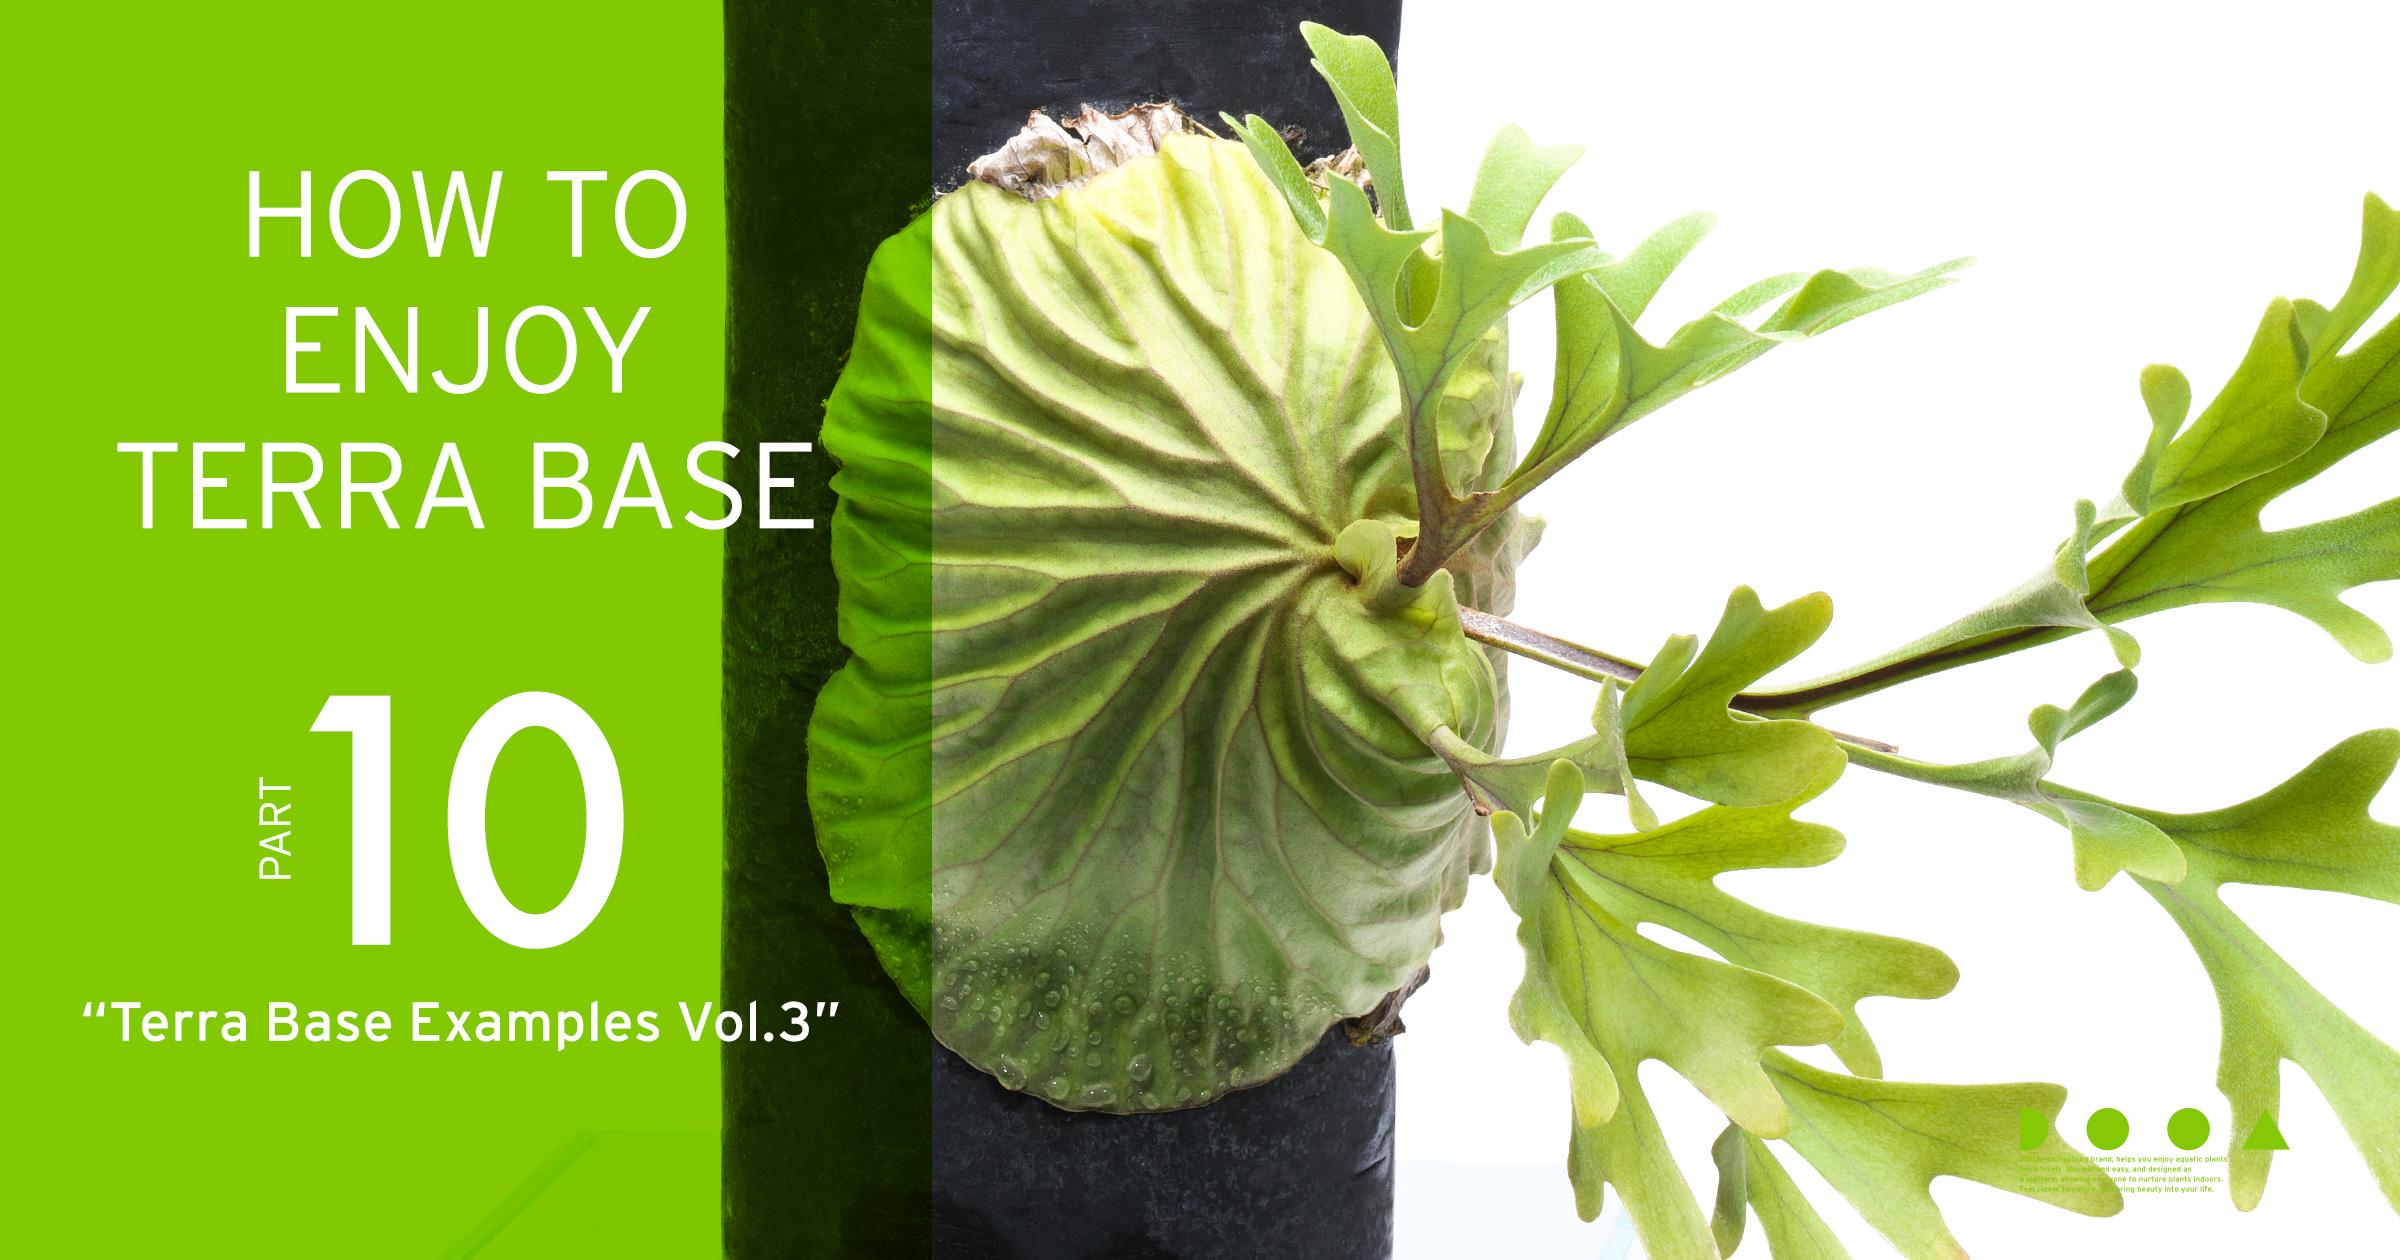 "HOW TO ENJOY TERRA BASE ""Terra Base Examples Vol.3"""